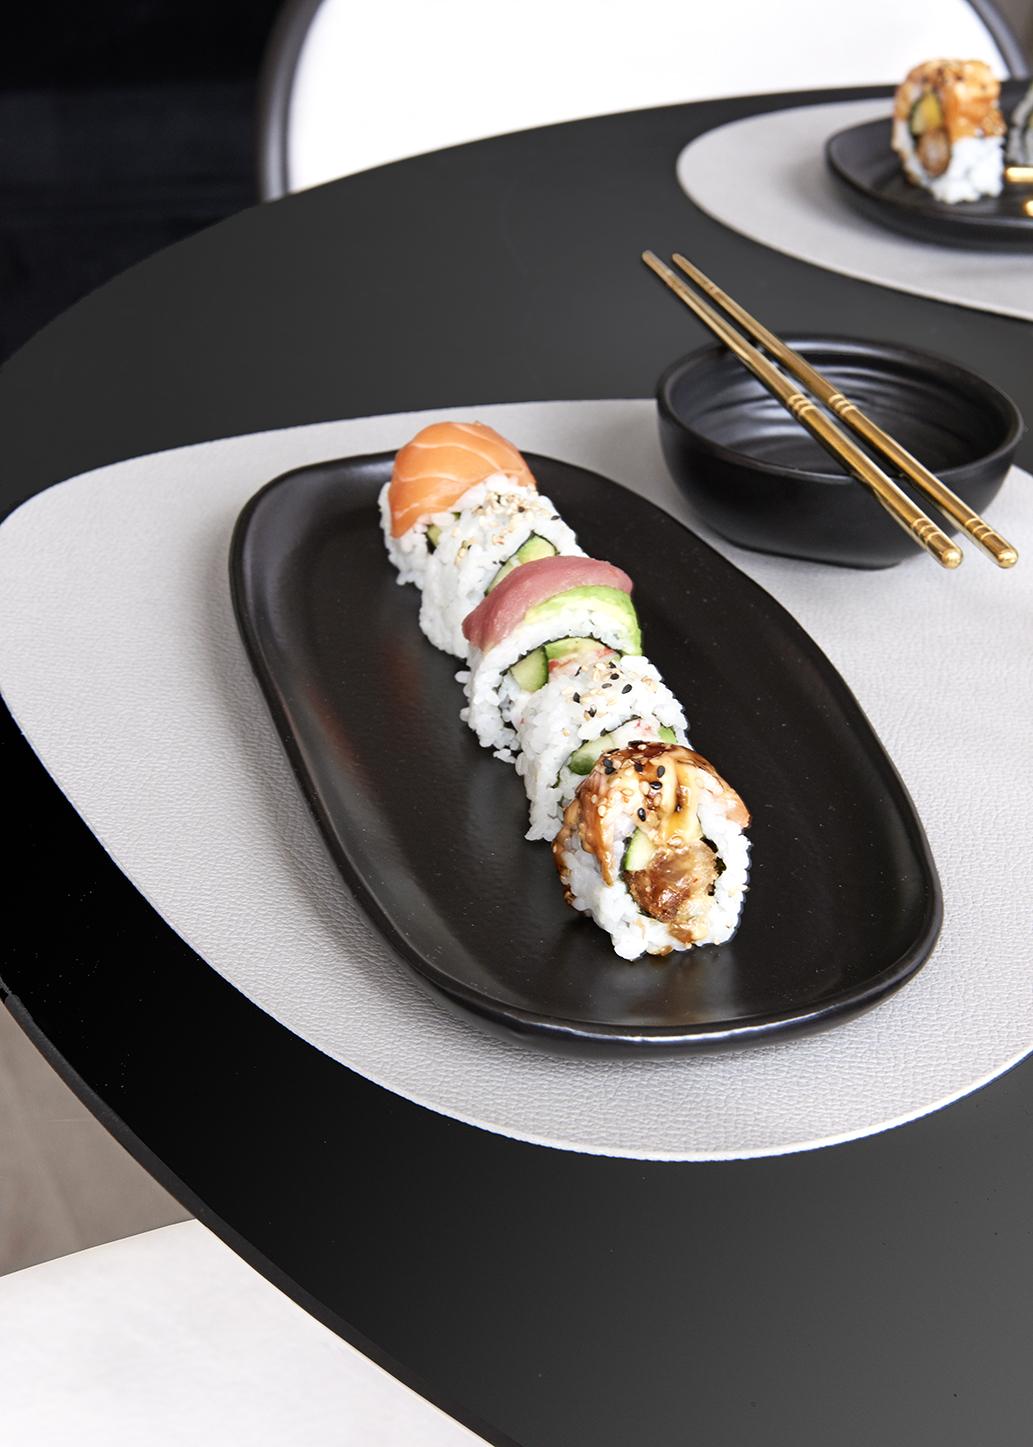 Quan sushiset fat + skål (4 delar)